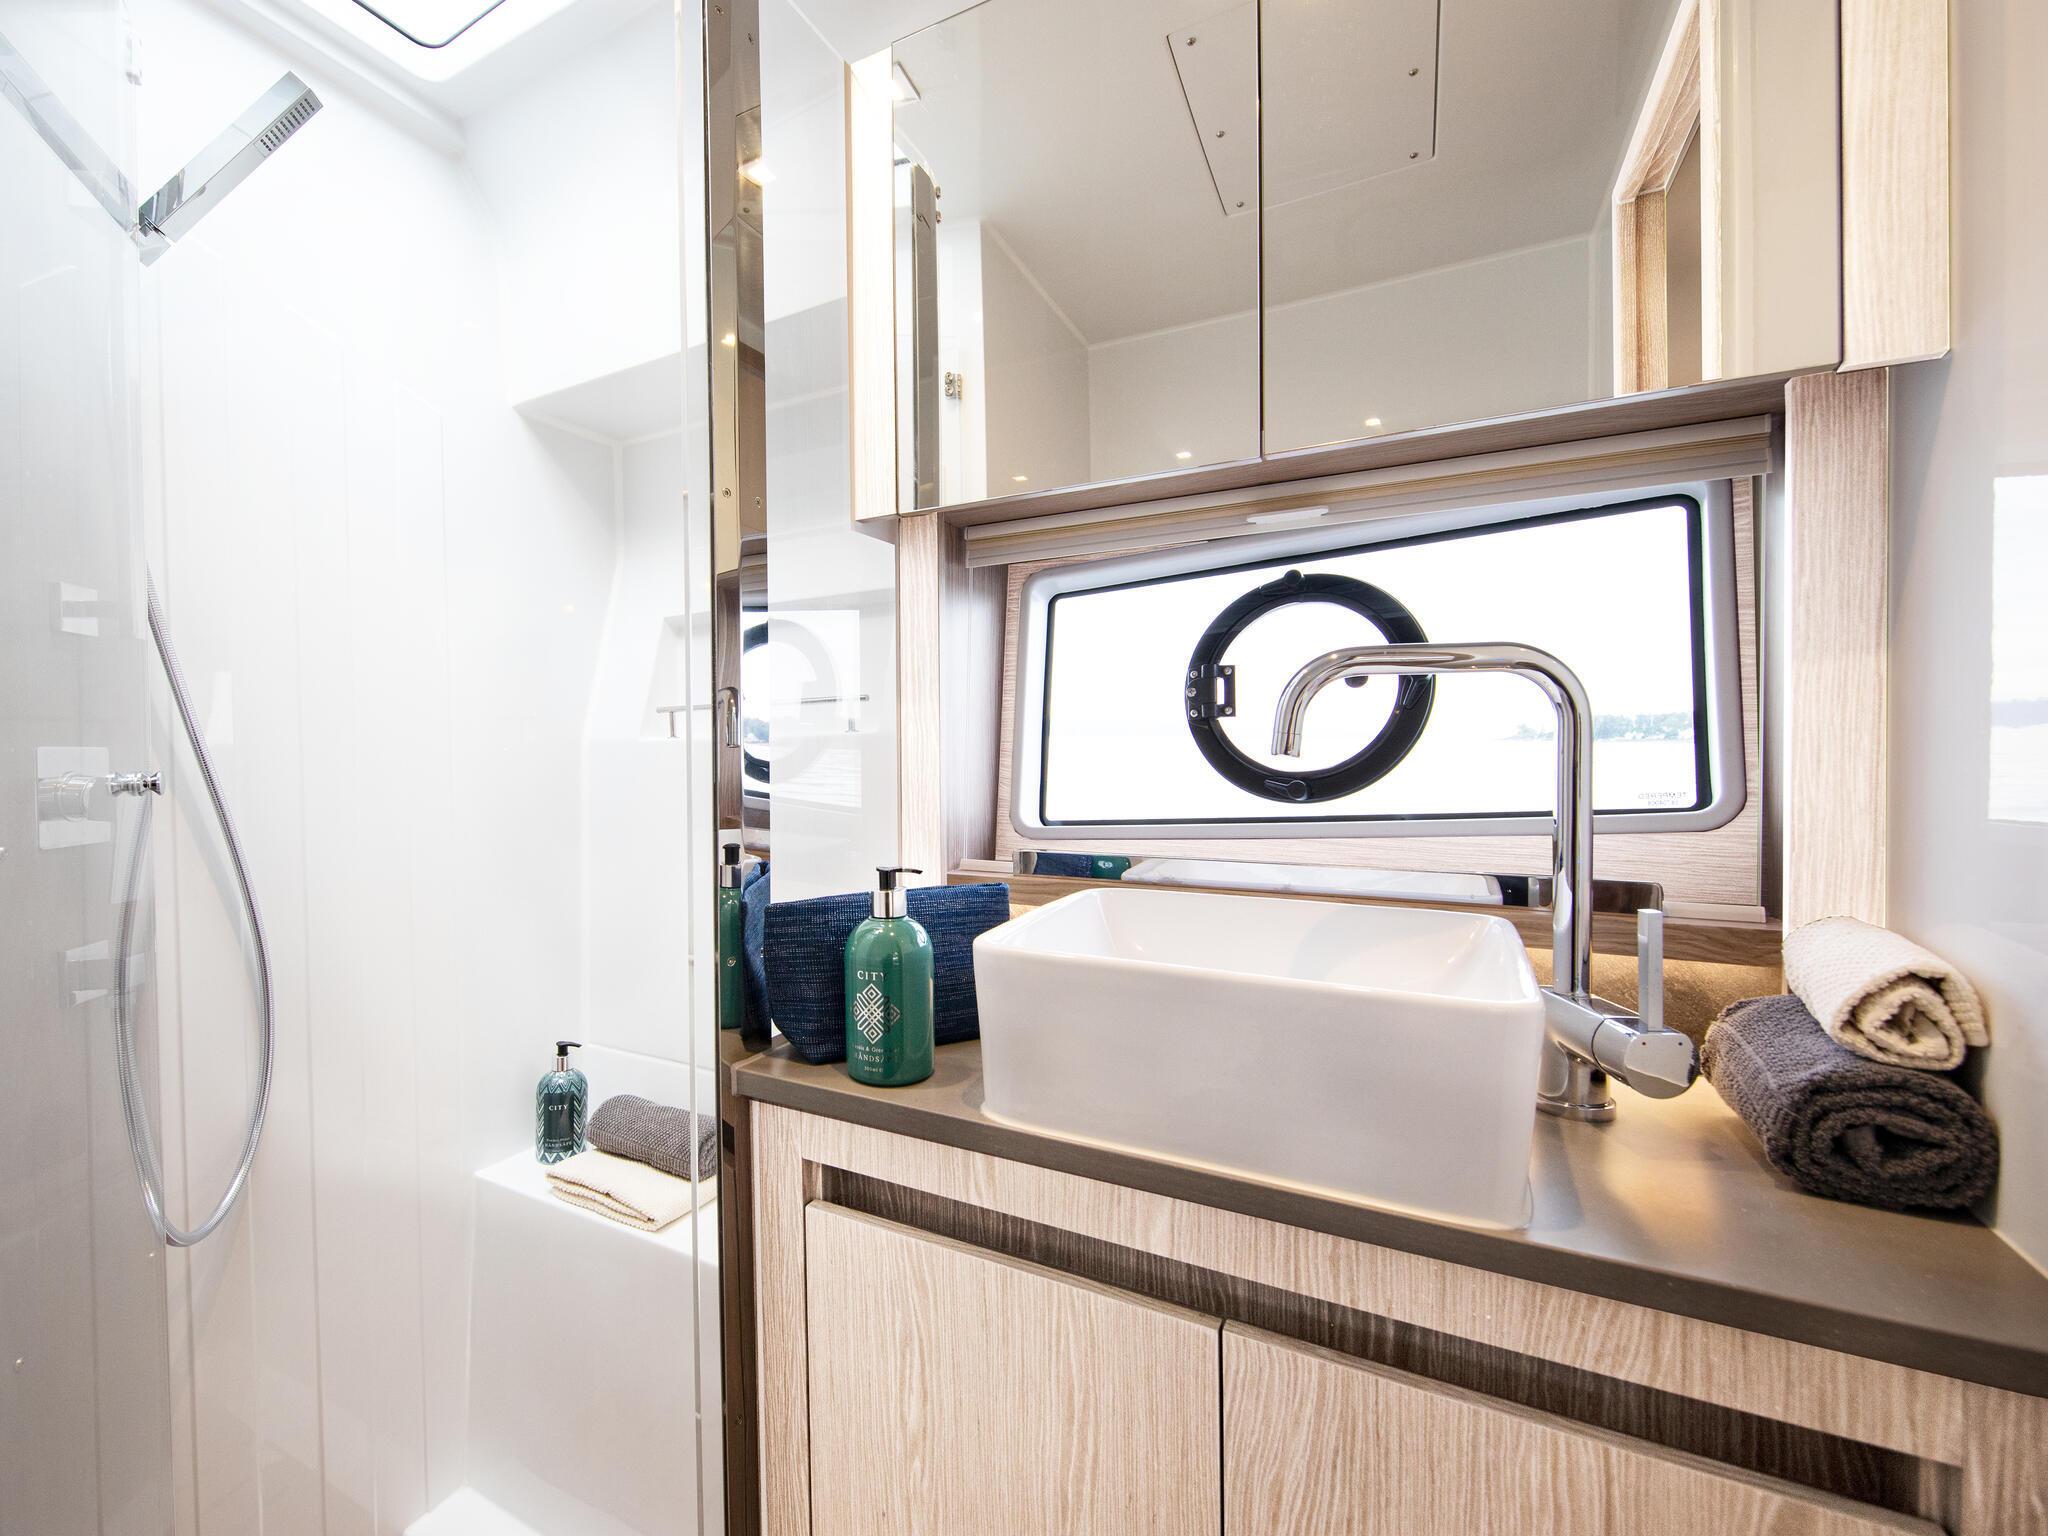 Sealine_C390_Interior_View_22_master_bathroom_0053